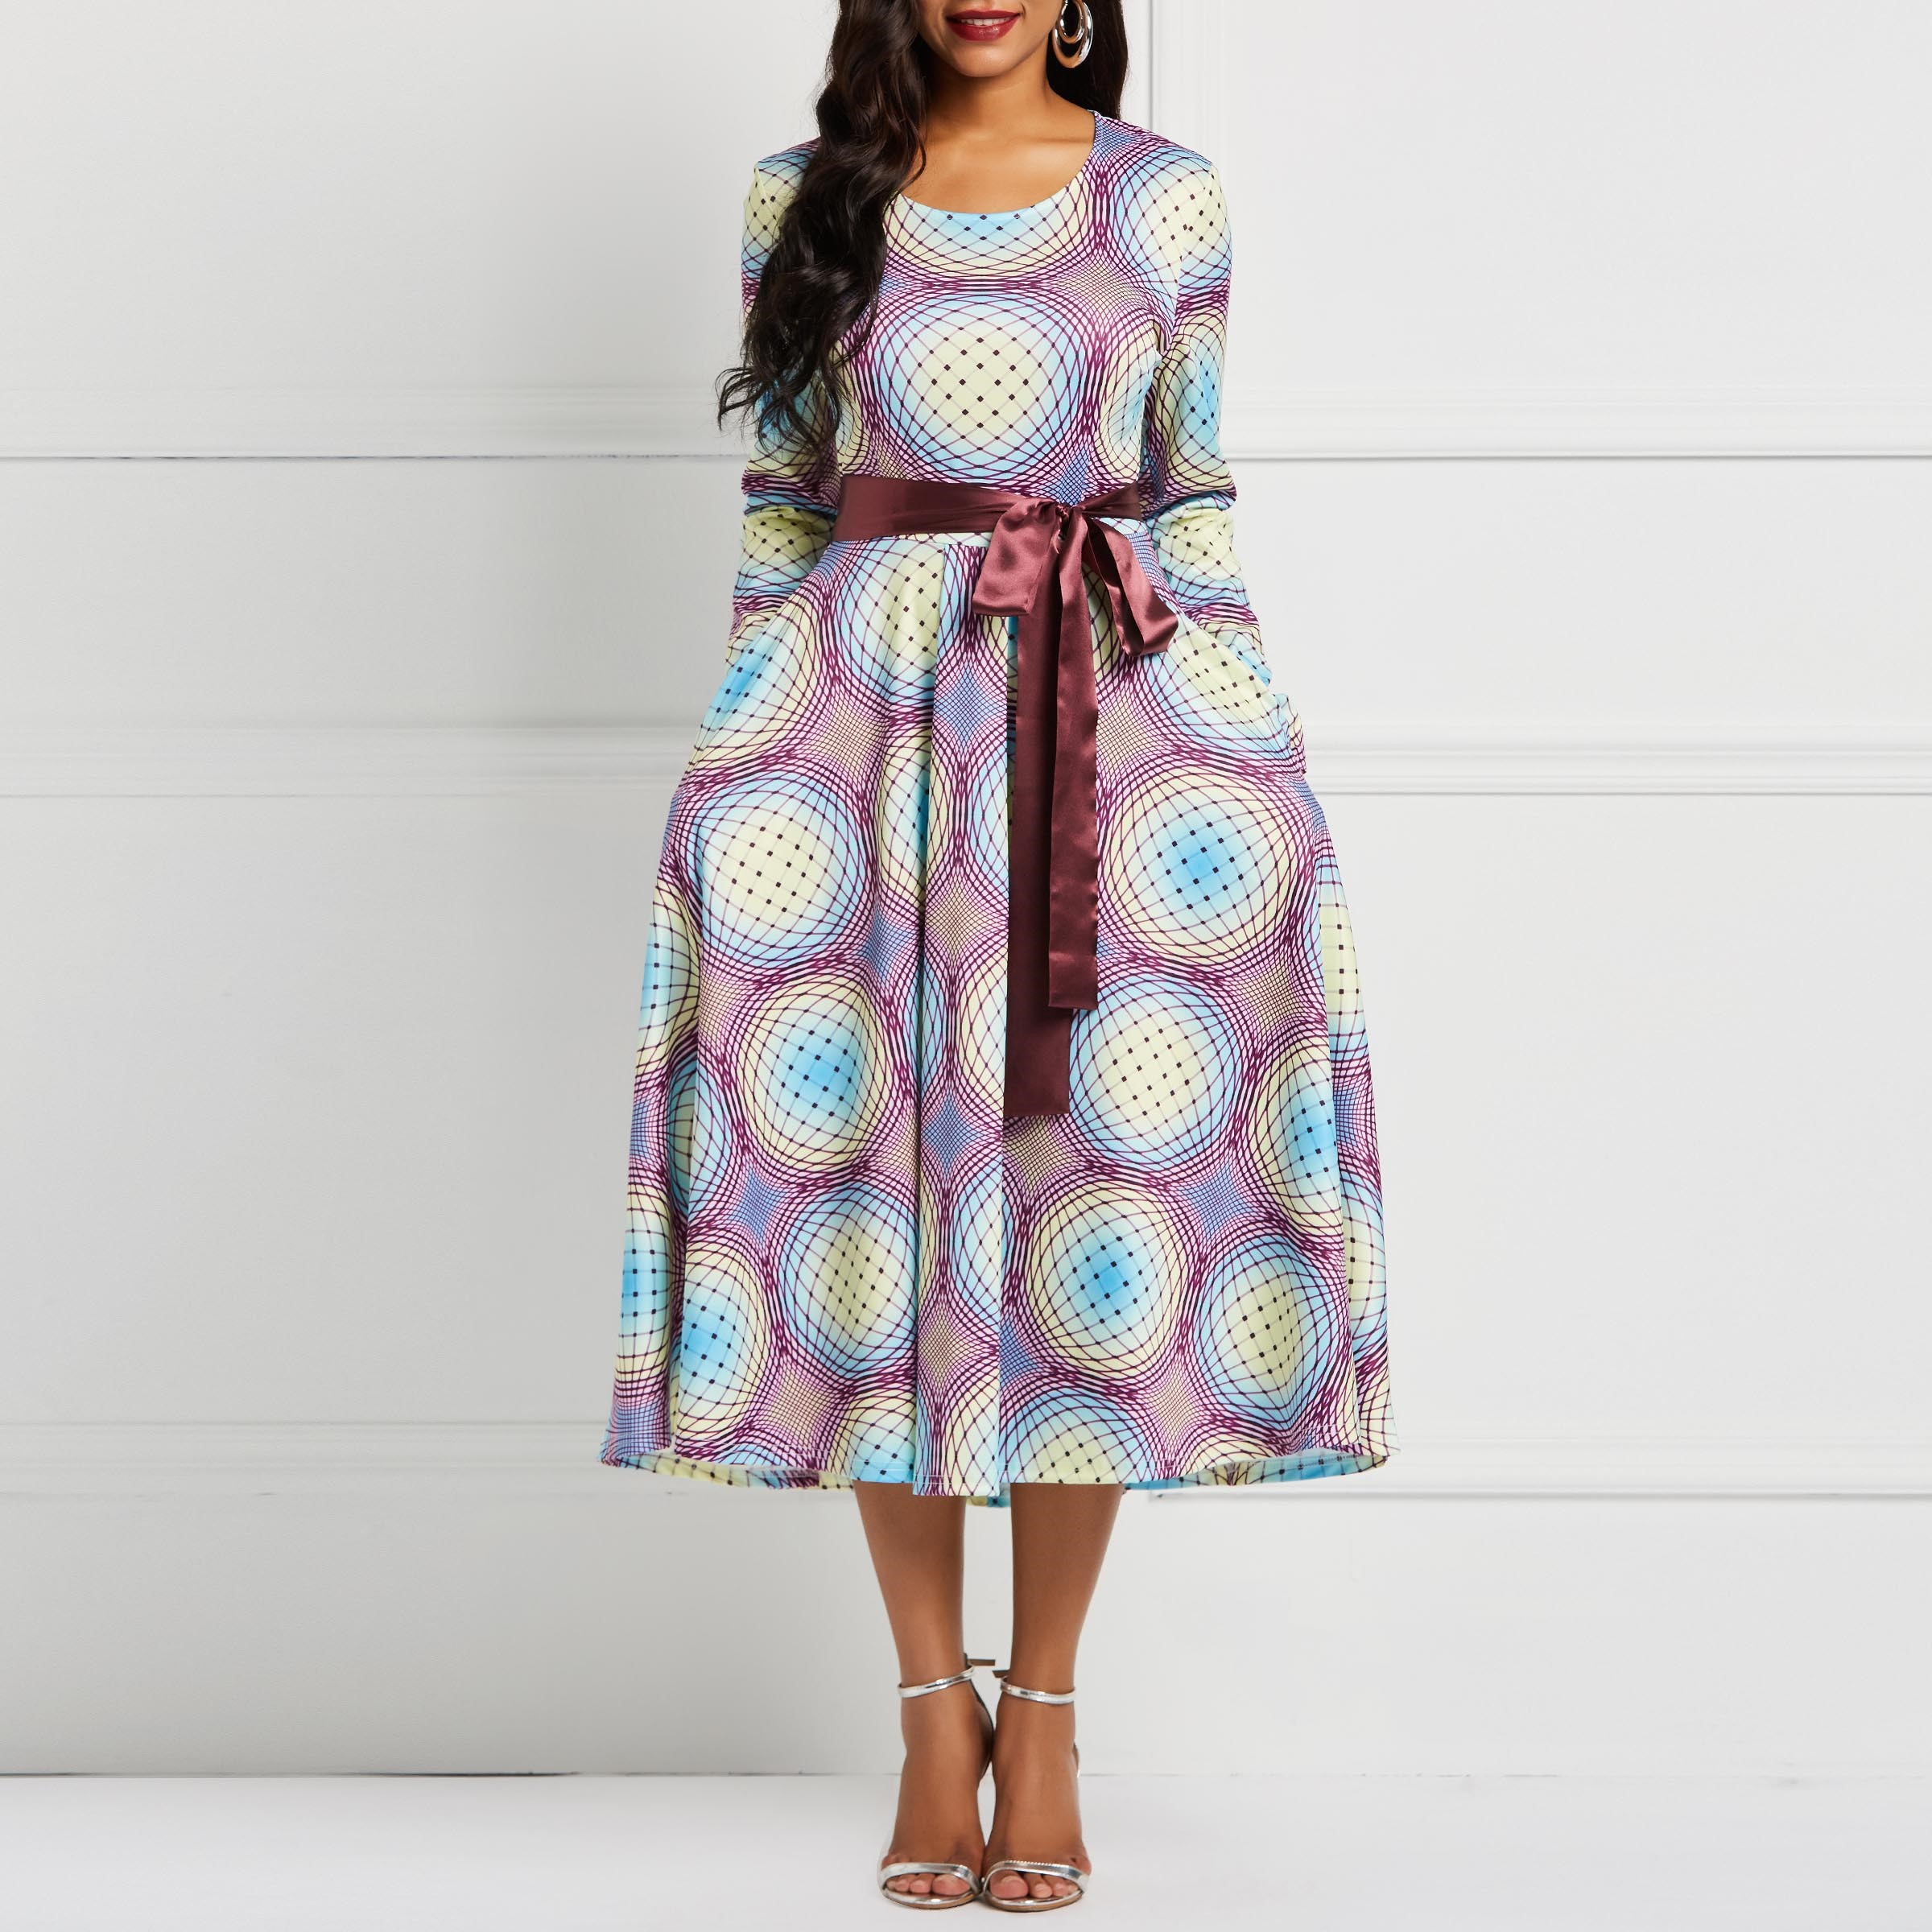 Women Midi Dresses Vintage Elegant Fashion High Elasticity Geometric Print Female Fashion Retro Purple Plus Size Skater Dress